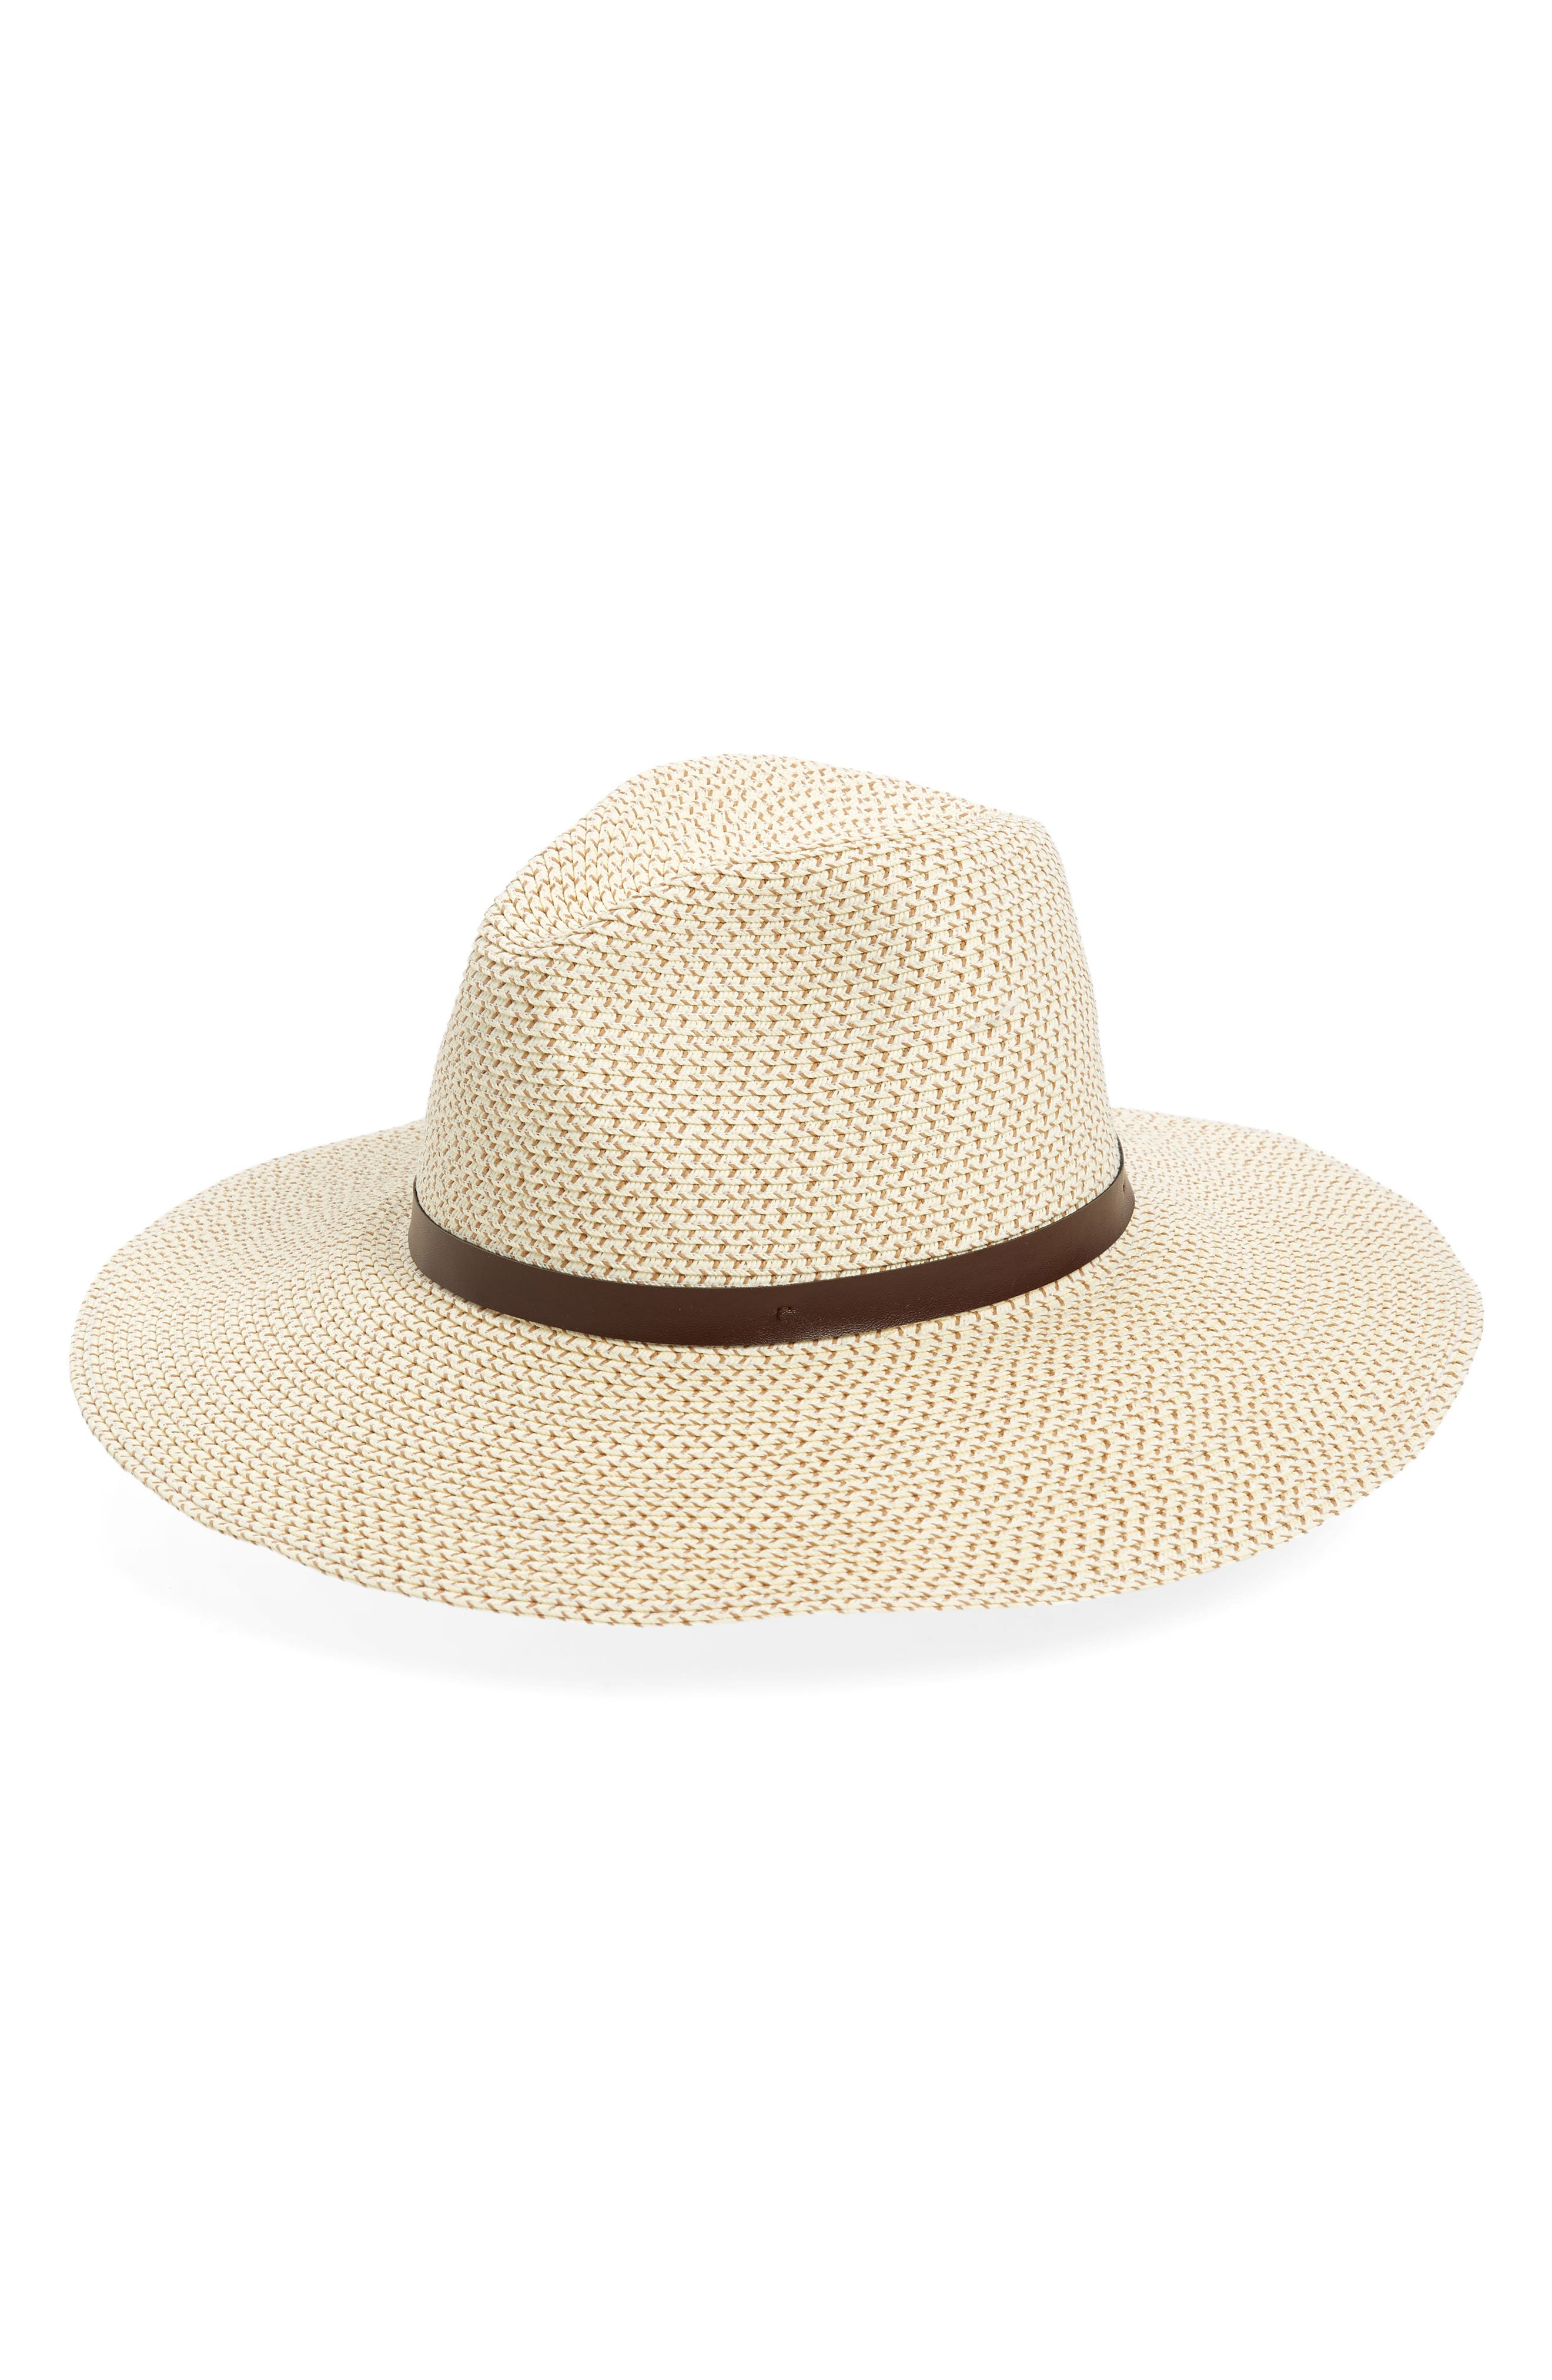 Band Straw Hat,                             Main thumbnail 1, color,                             Ivory